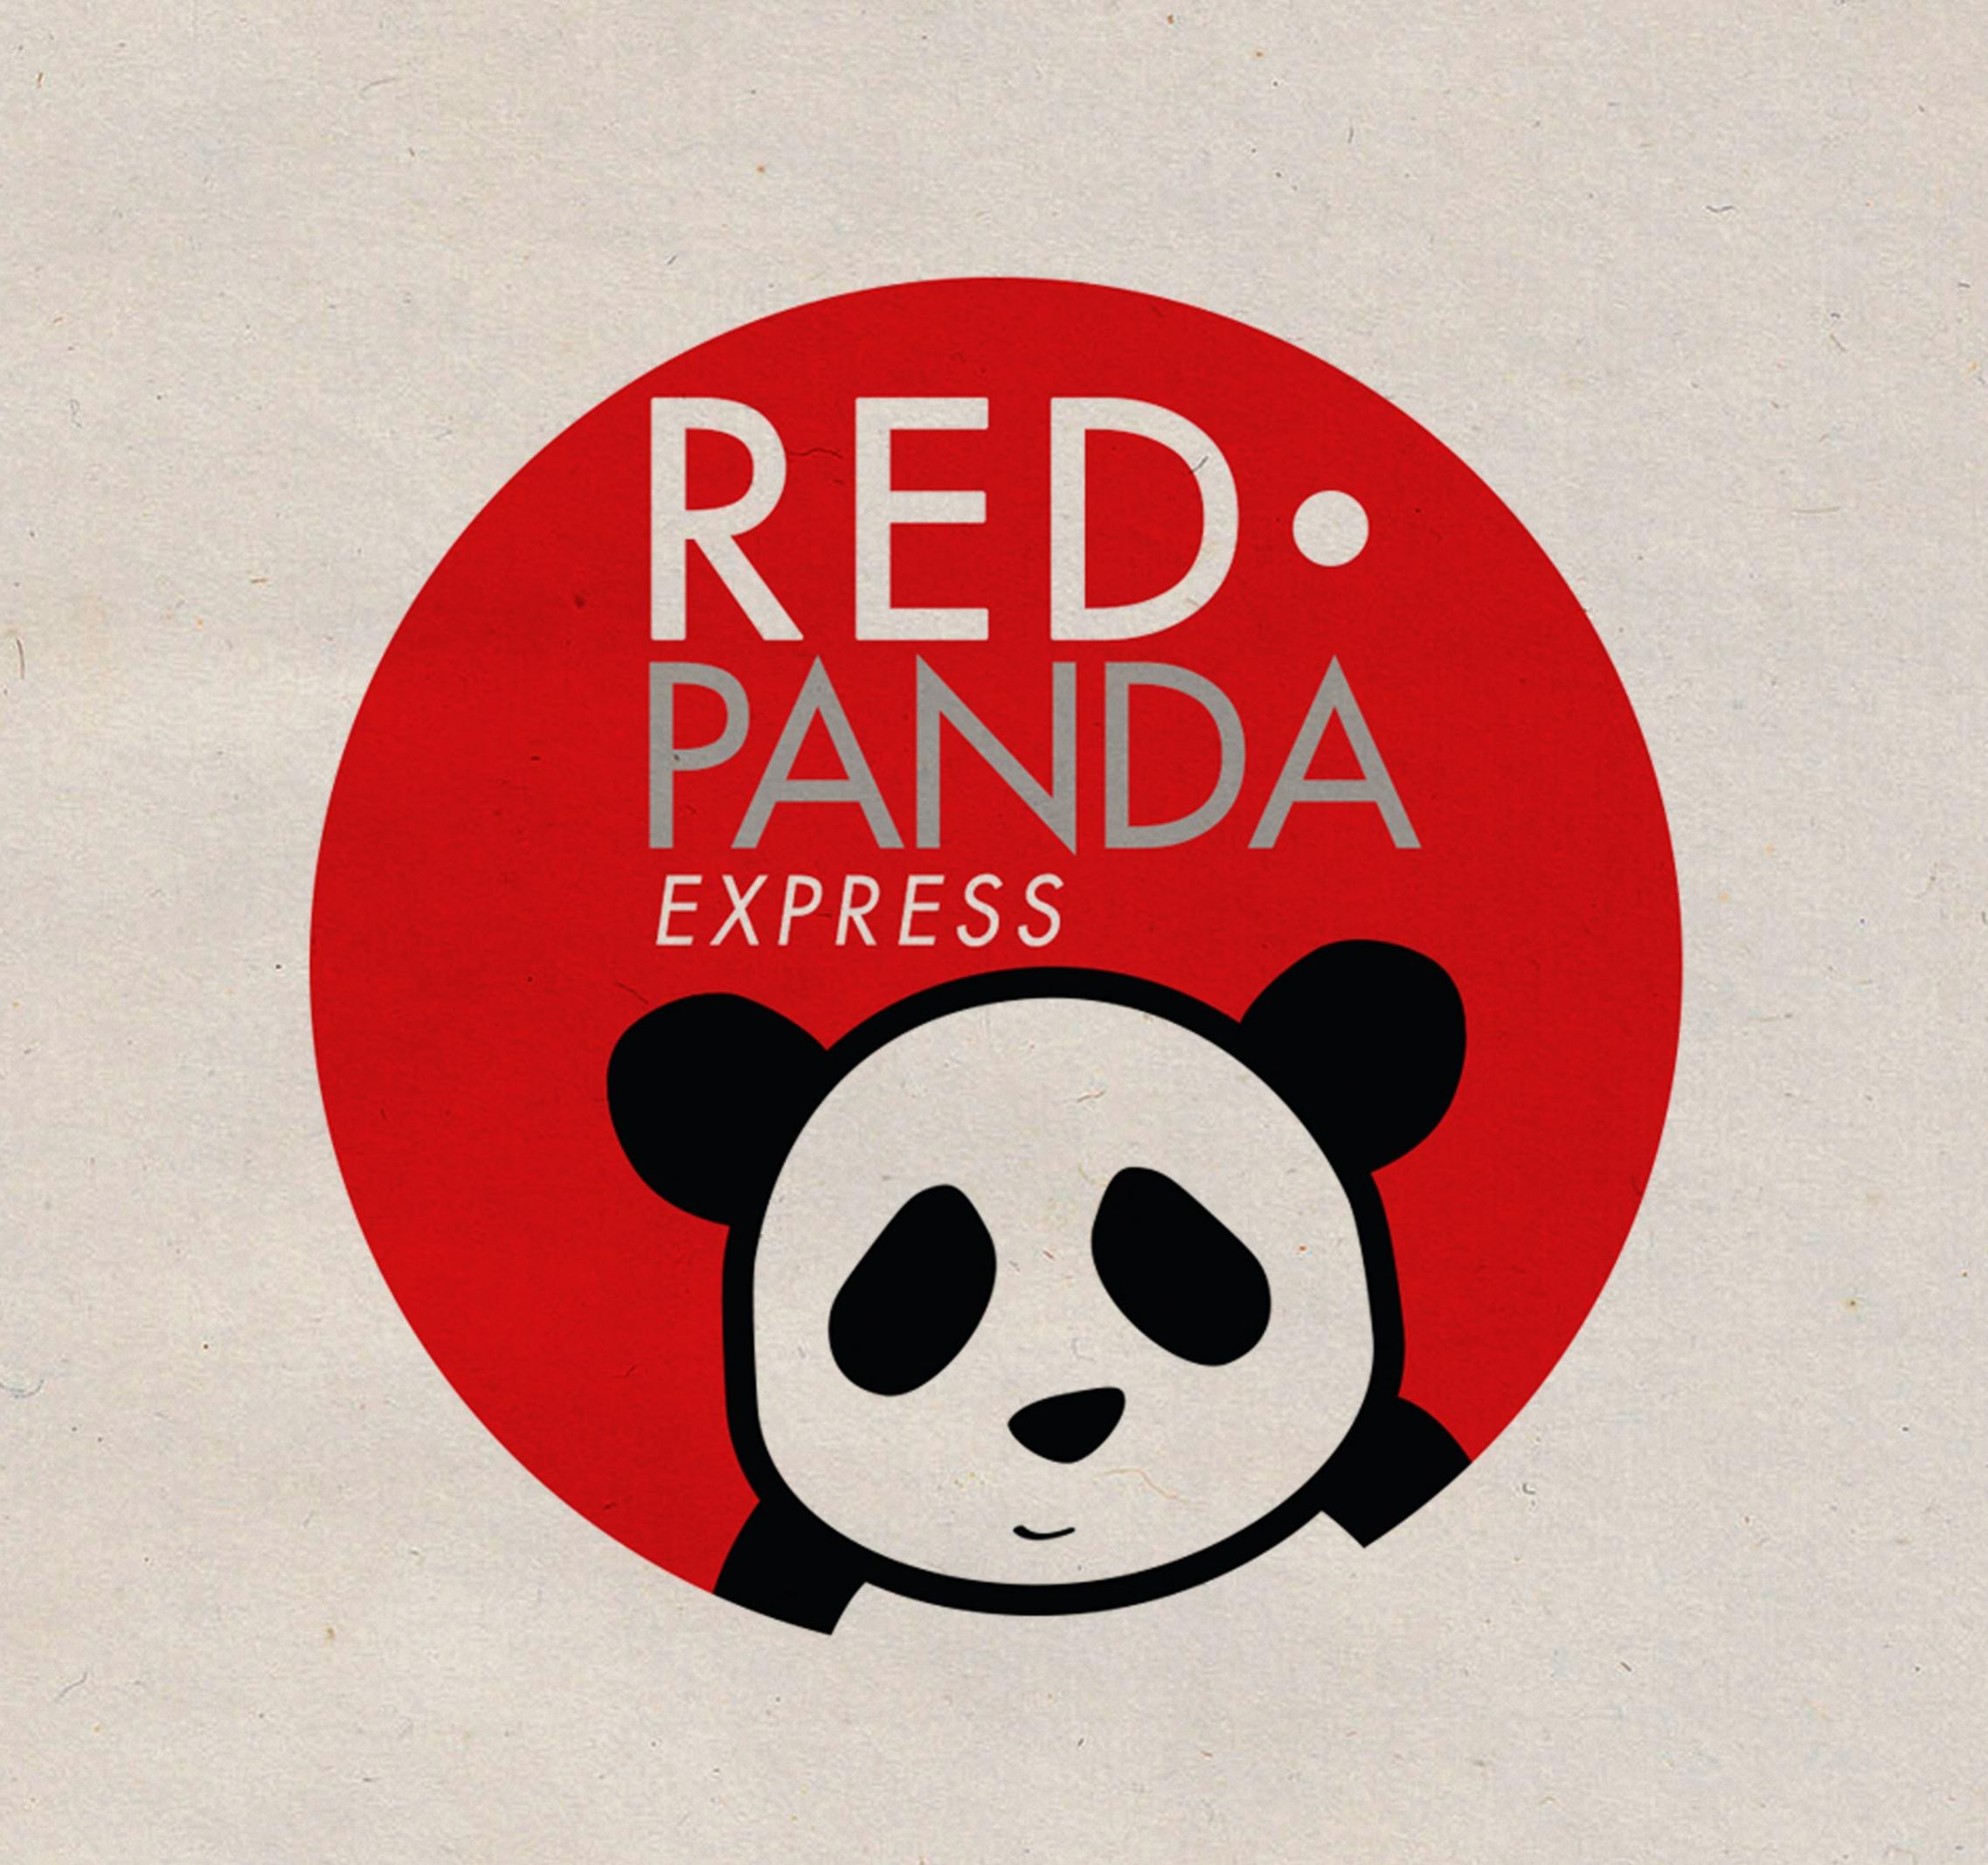 red panda logo circle round vector graphic design company artist studio art layout metro Manila Philippines